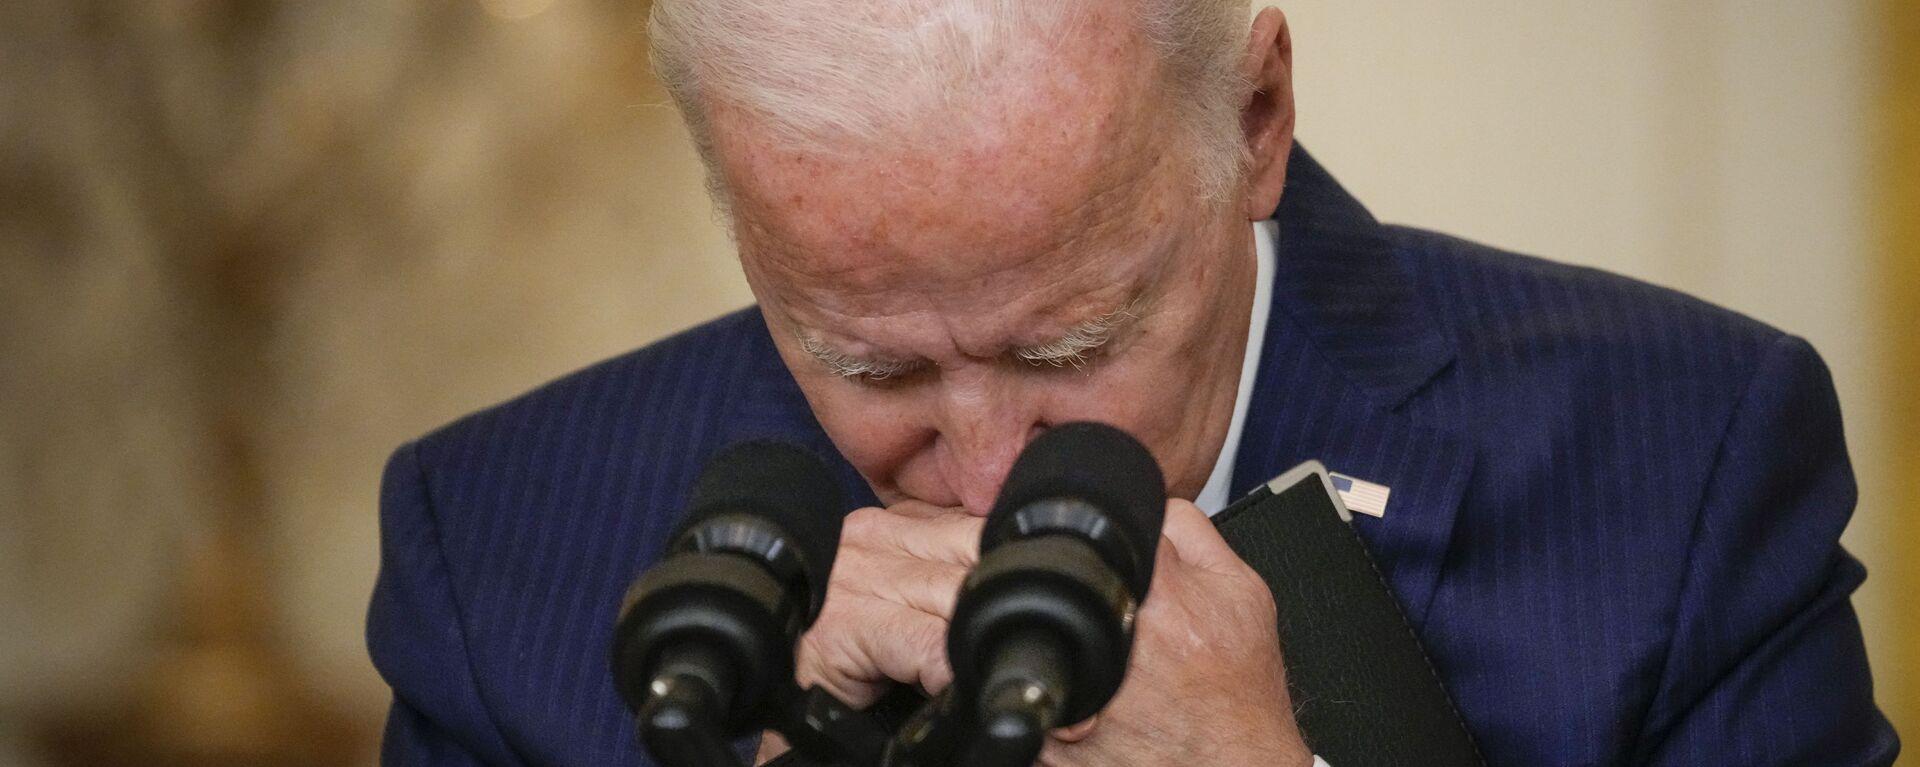 Tổng thống Hoa Kỳ Joe Biden - Sputnik Việt Nam, 1920, 29.08.2021